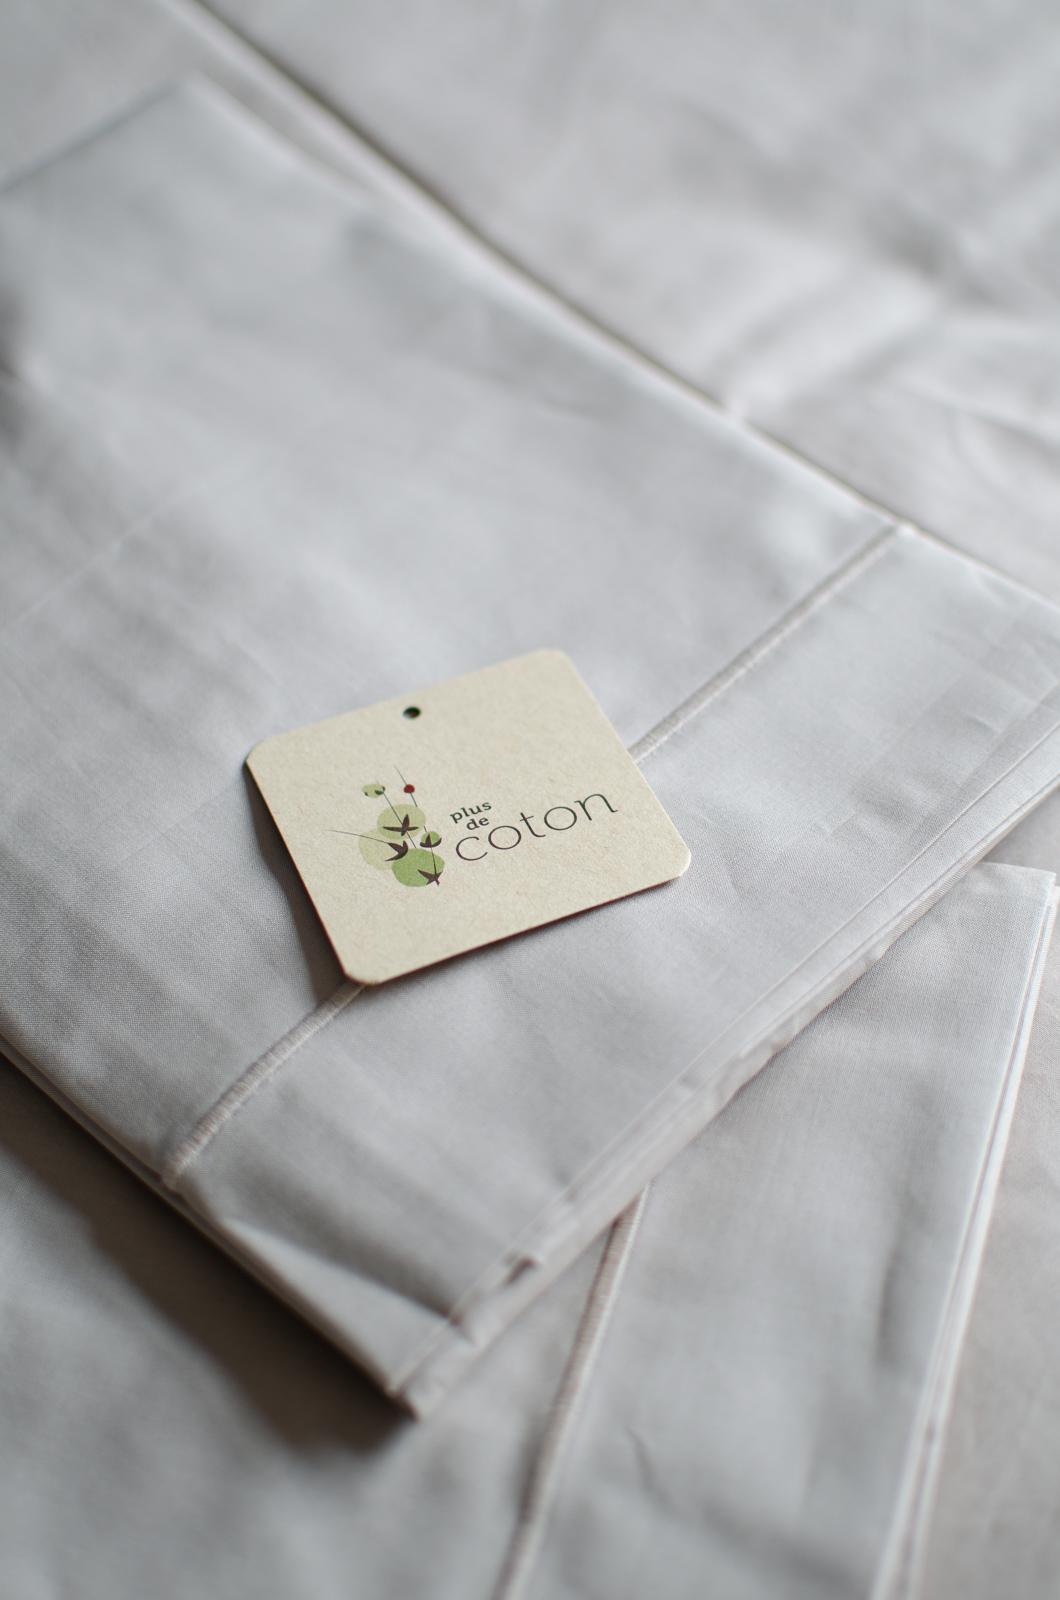 Plus de Coton - Coton Bio